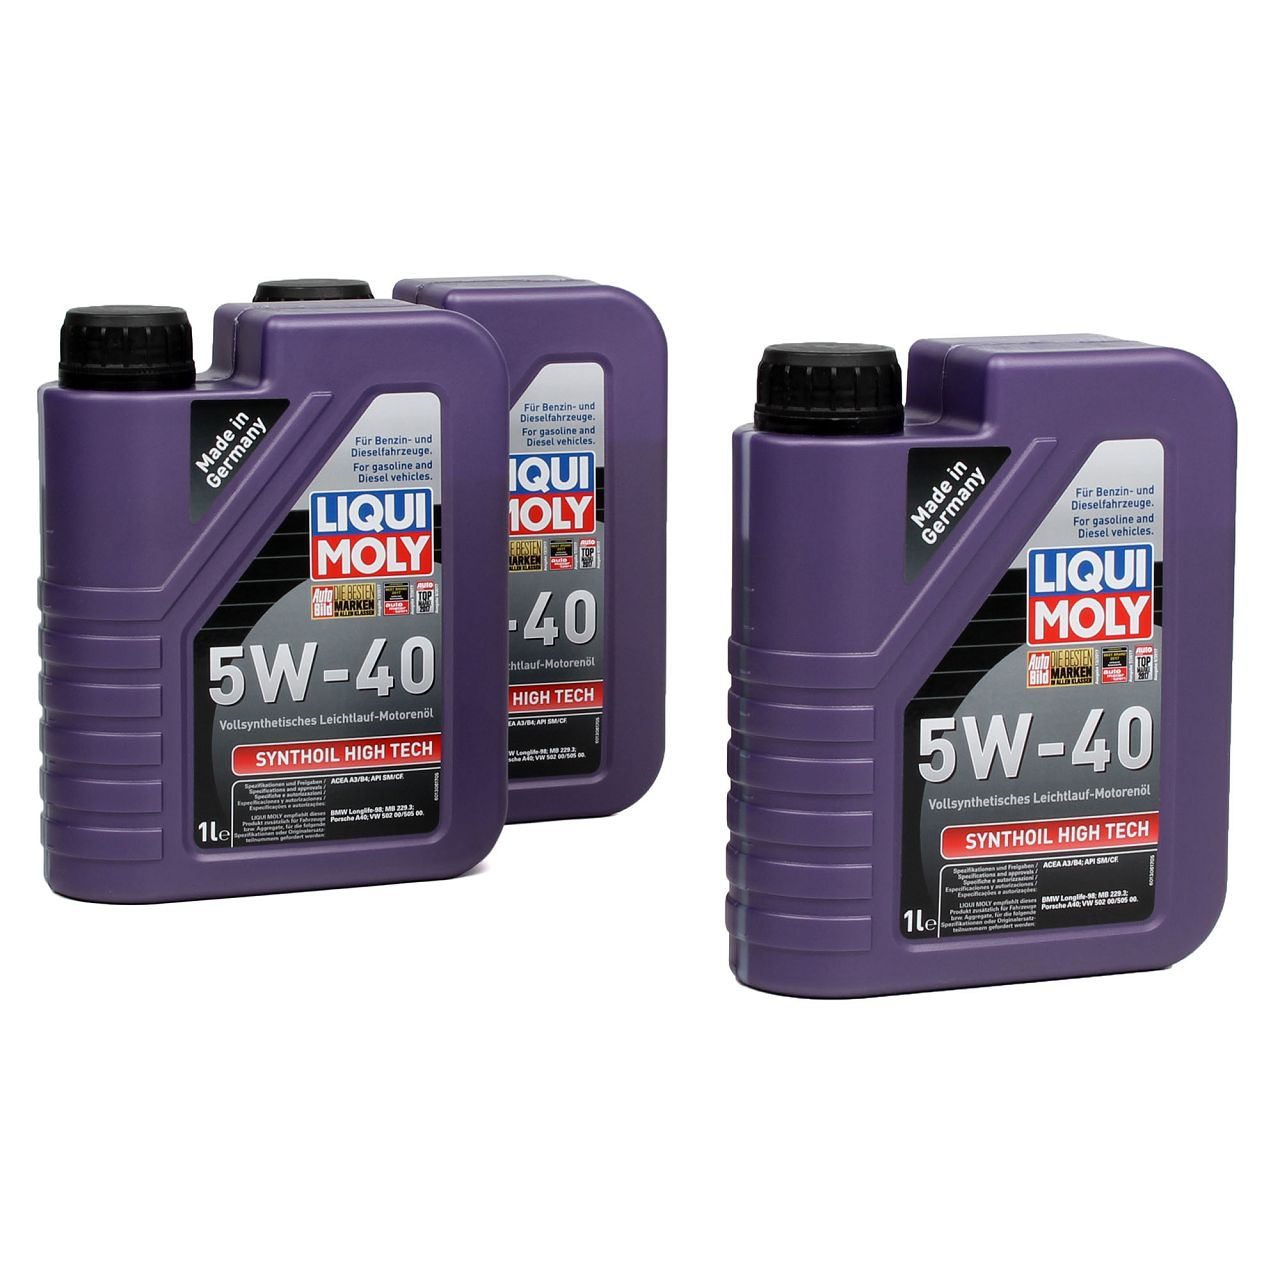 LIQUI MOLY Motoröl Öl SYNTHOIL HIGH TECH 5W40 5W-40 3L 3 Liter 1306